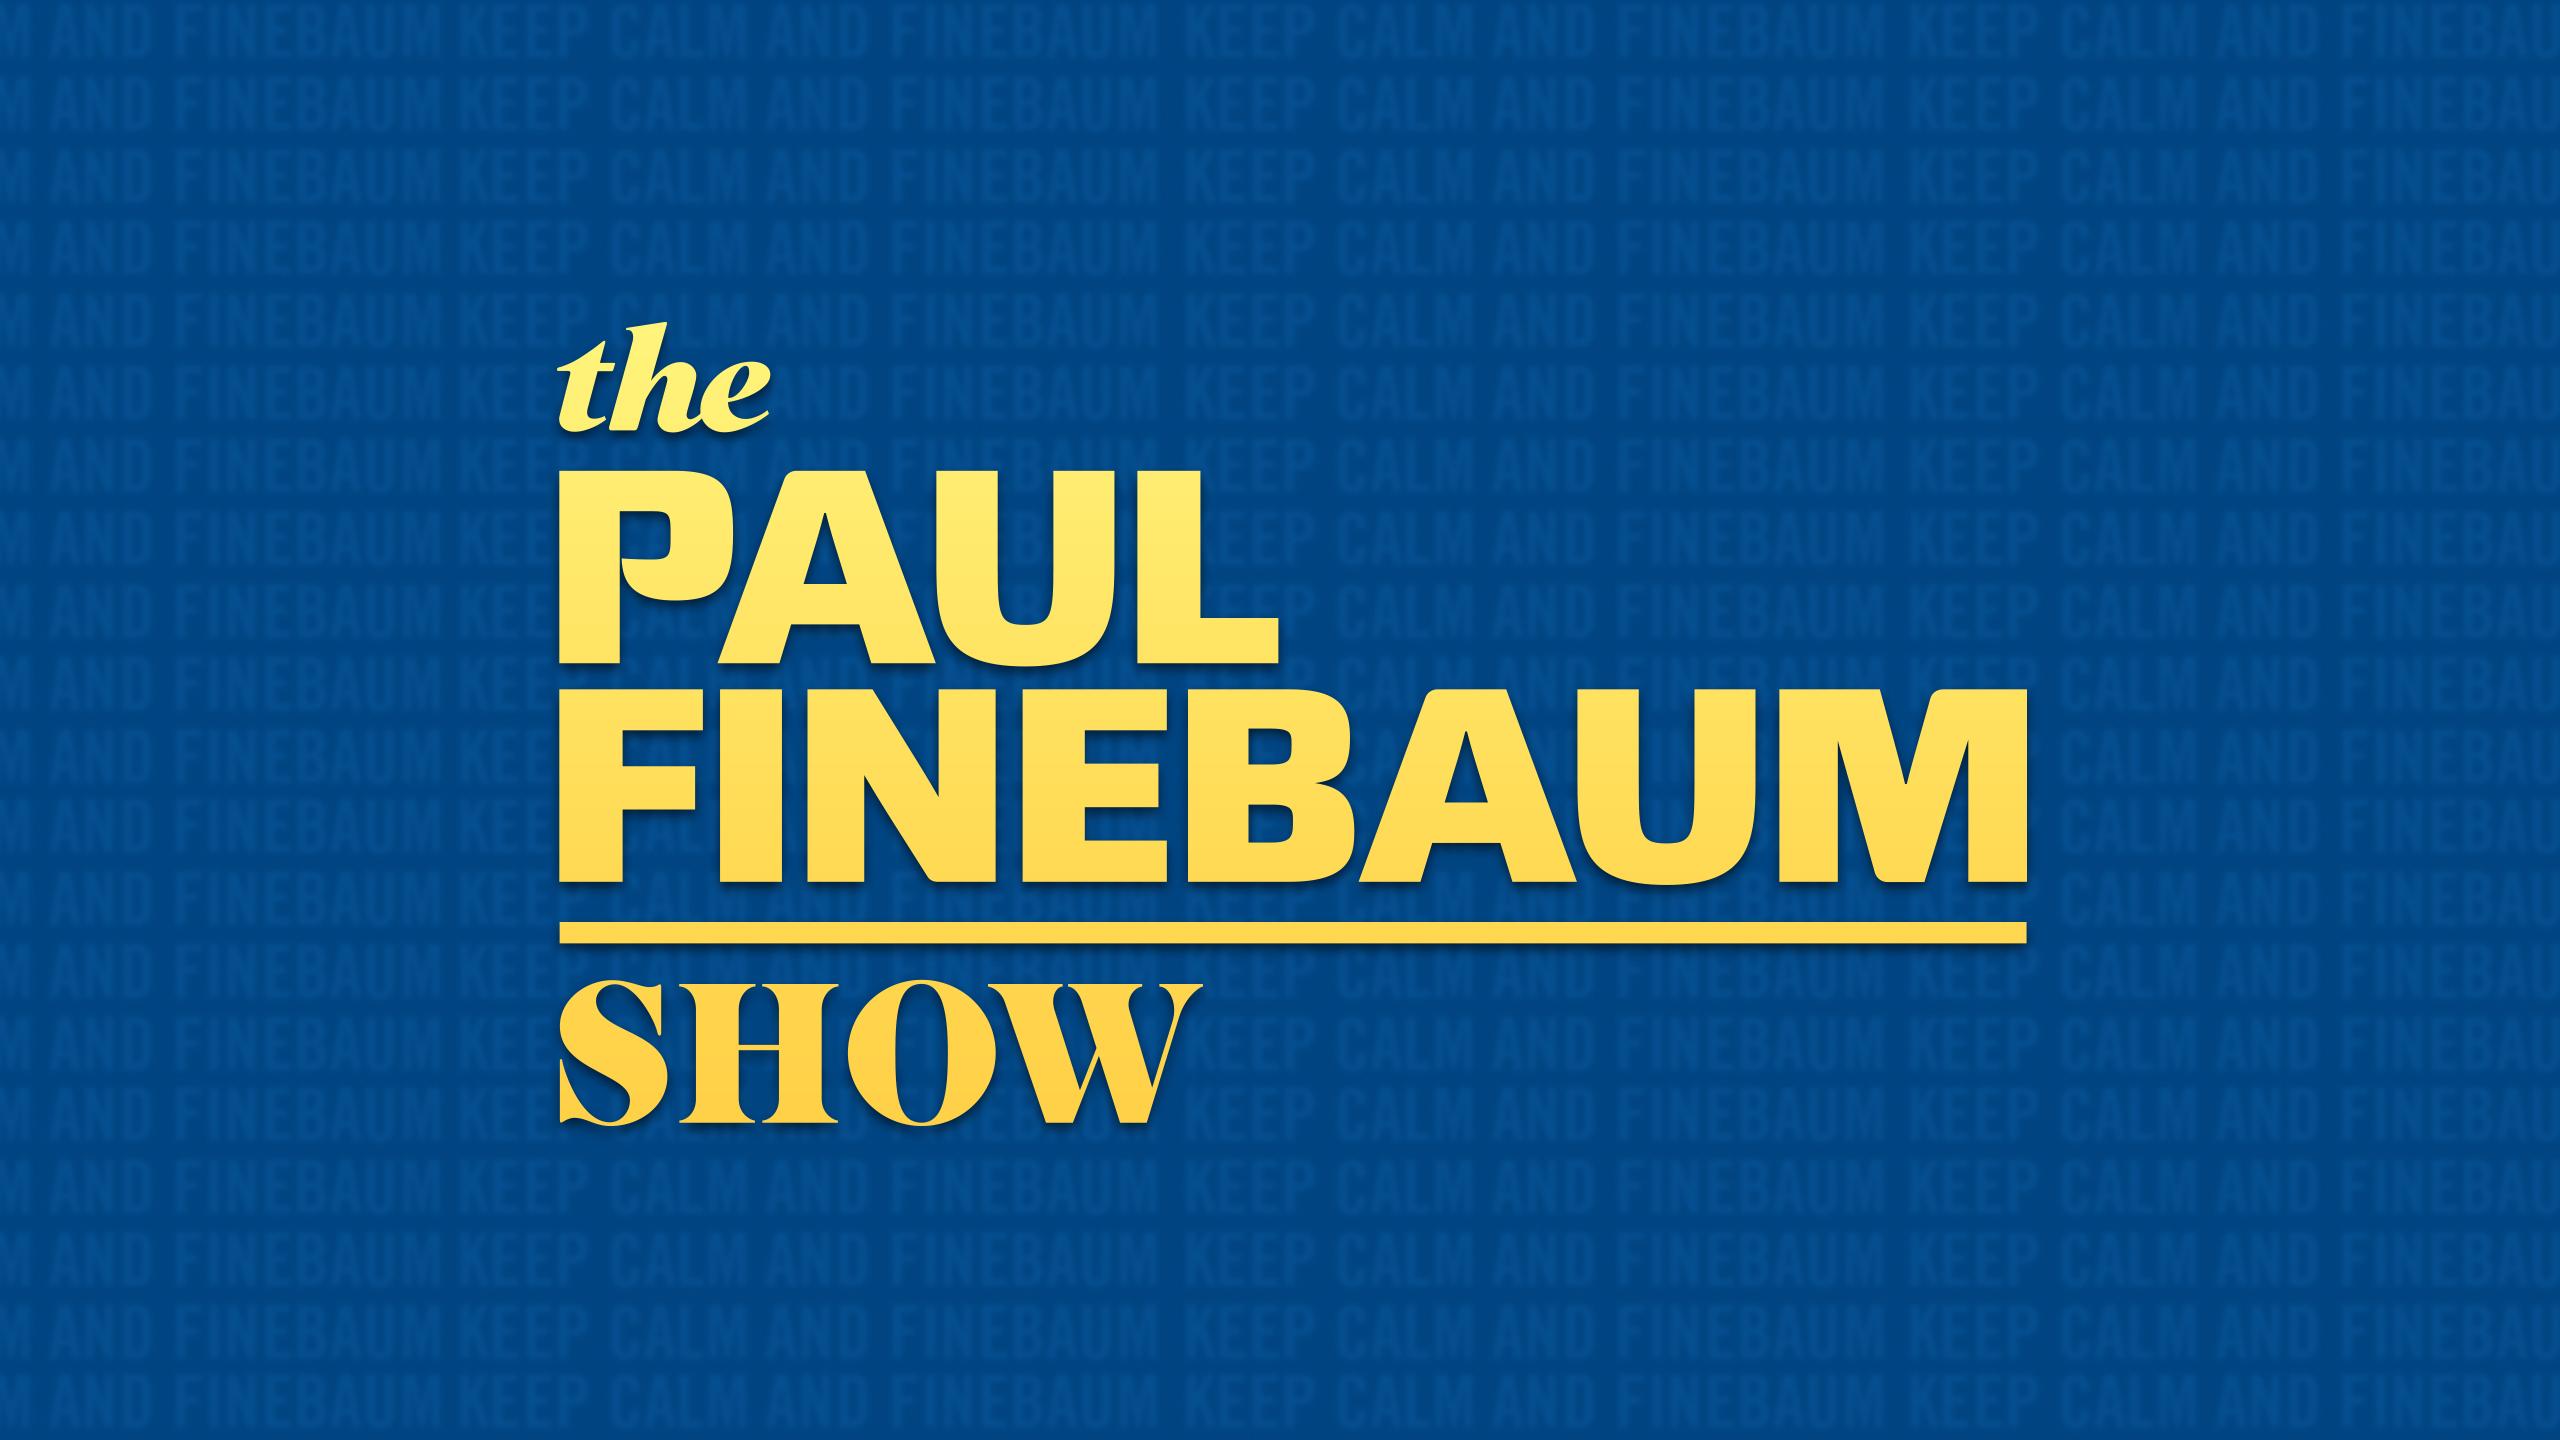 Mon, 12/17 - The Paul Finebaum Show